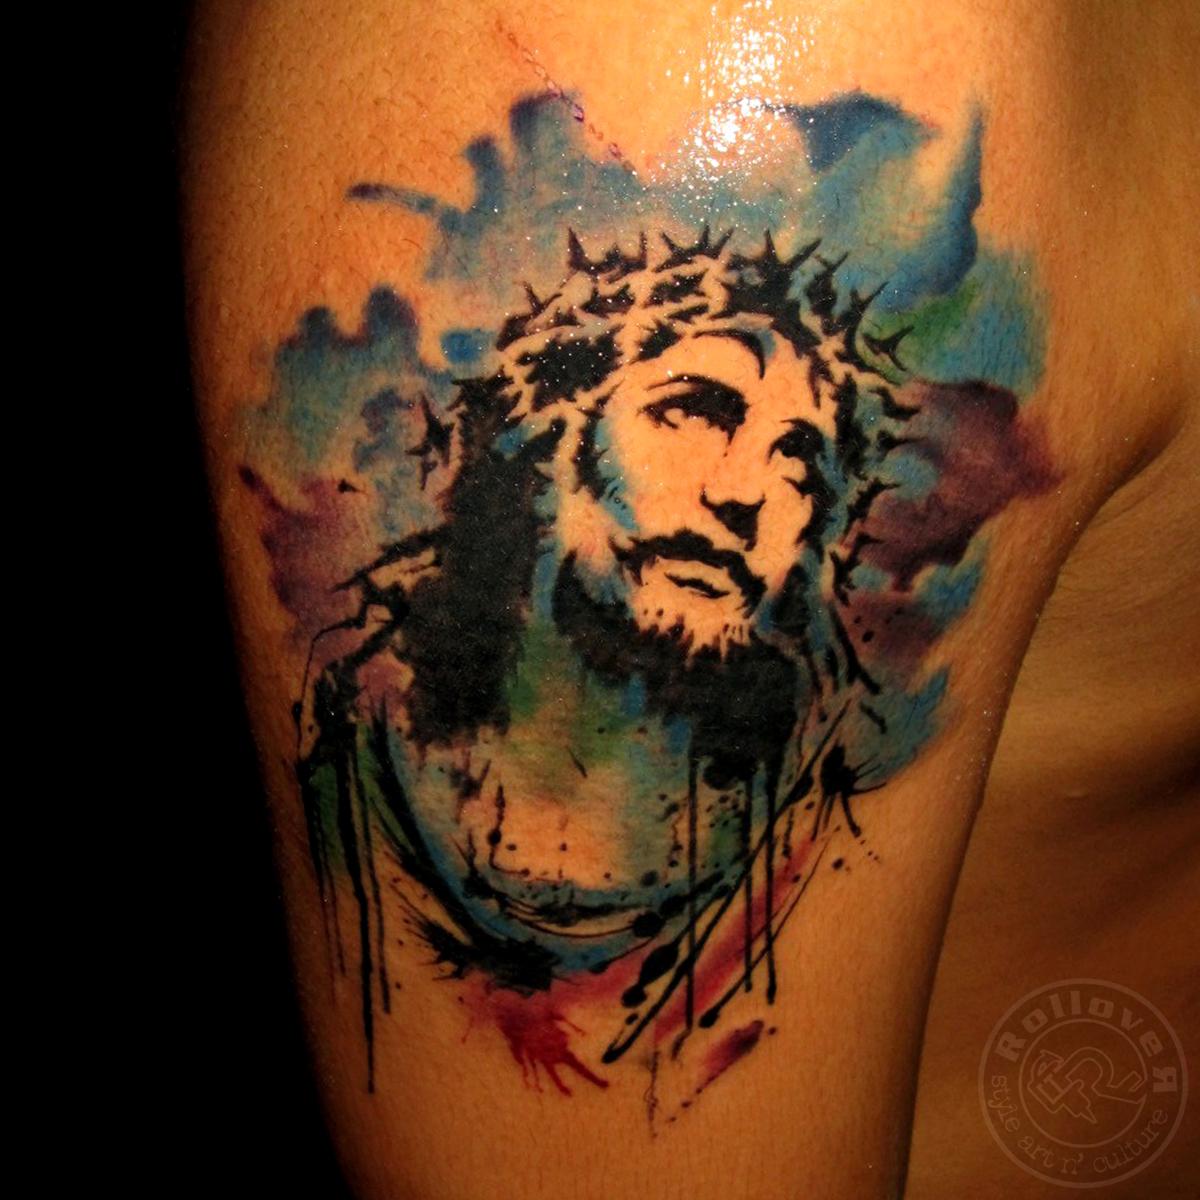 rollovertattoo Indonesia: watrcolortattoo, jesus tattoo